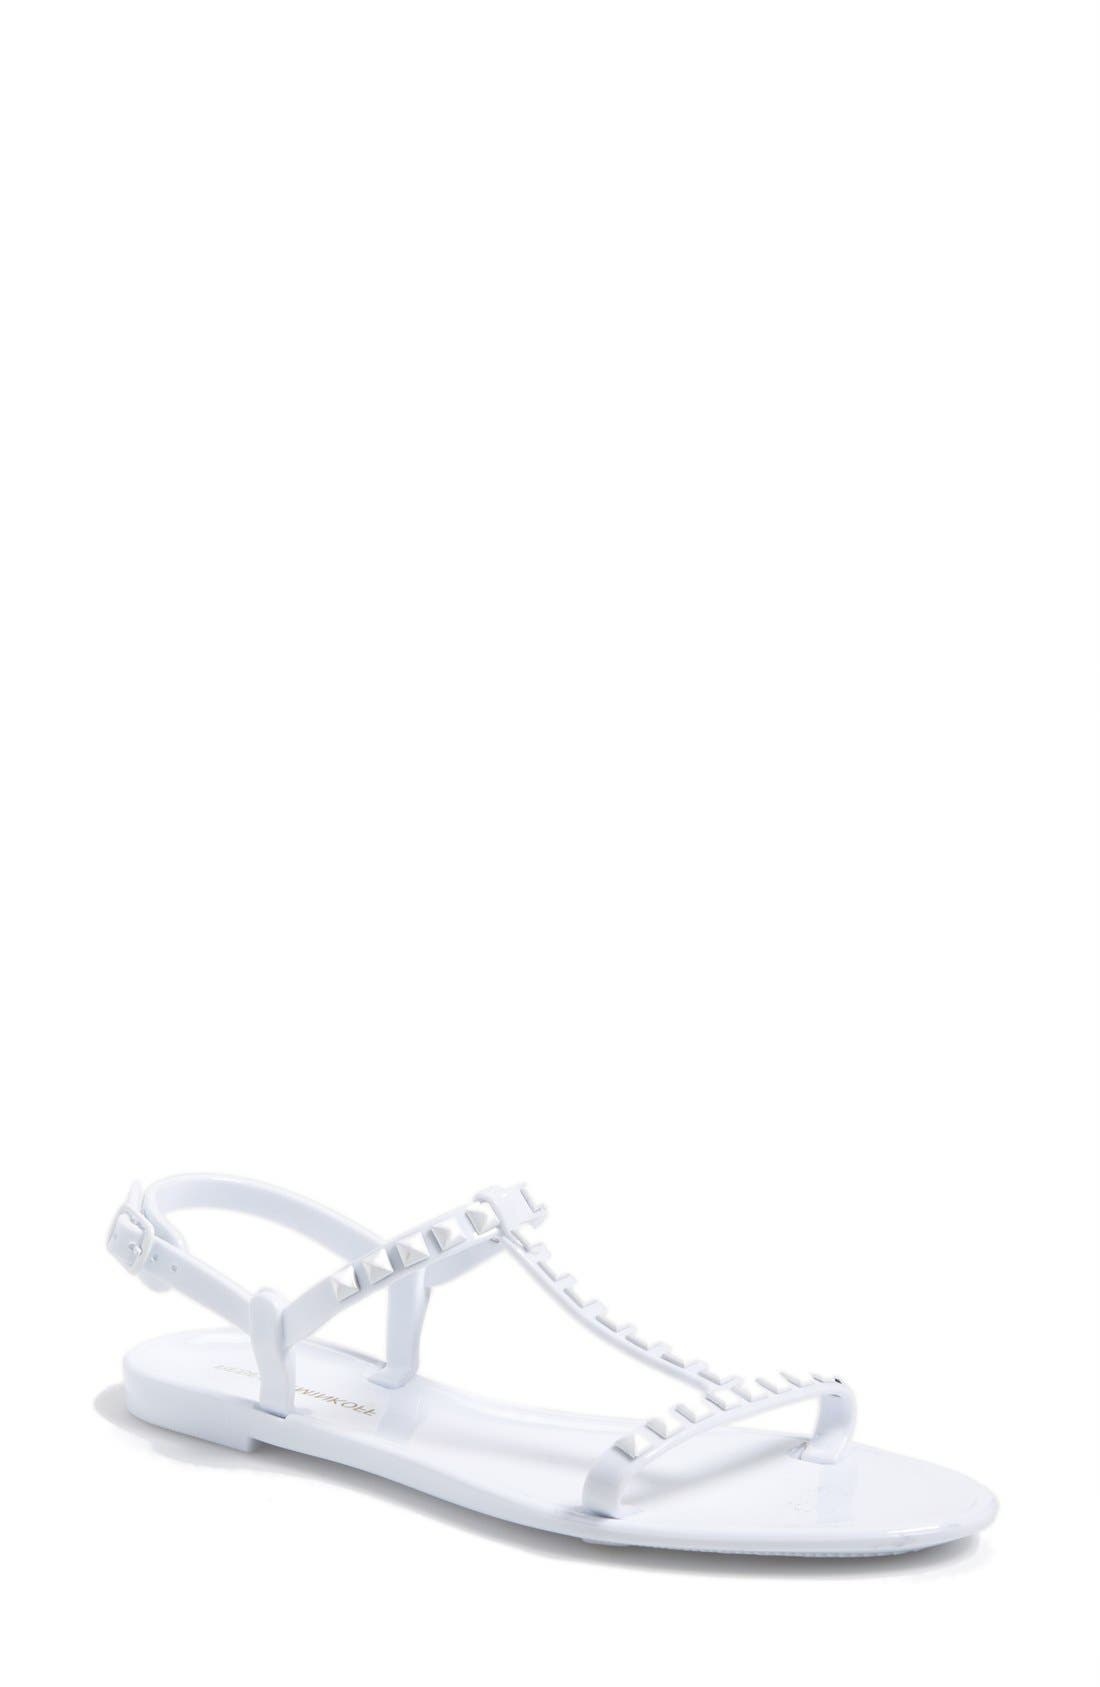 Main Image - Rebecca Minkoff 'Sava' Sandal